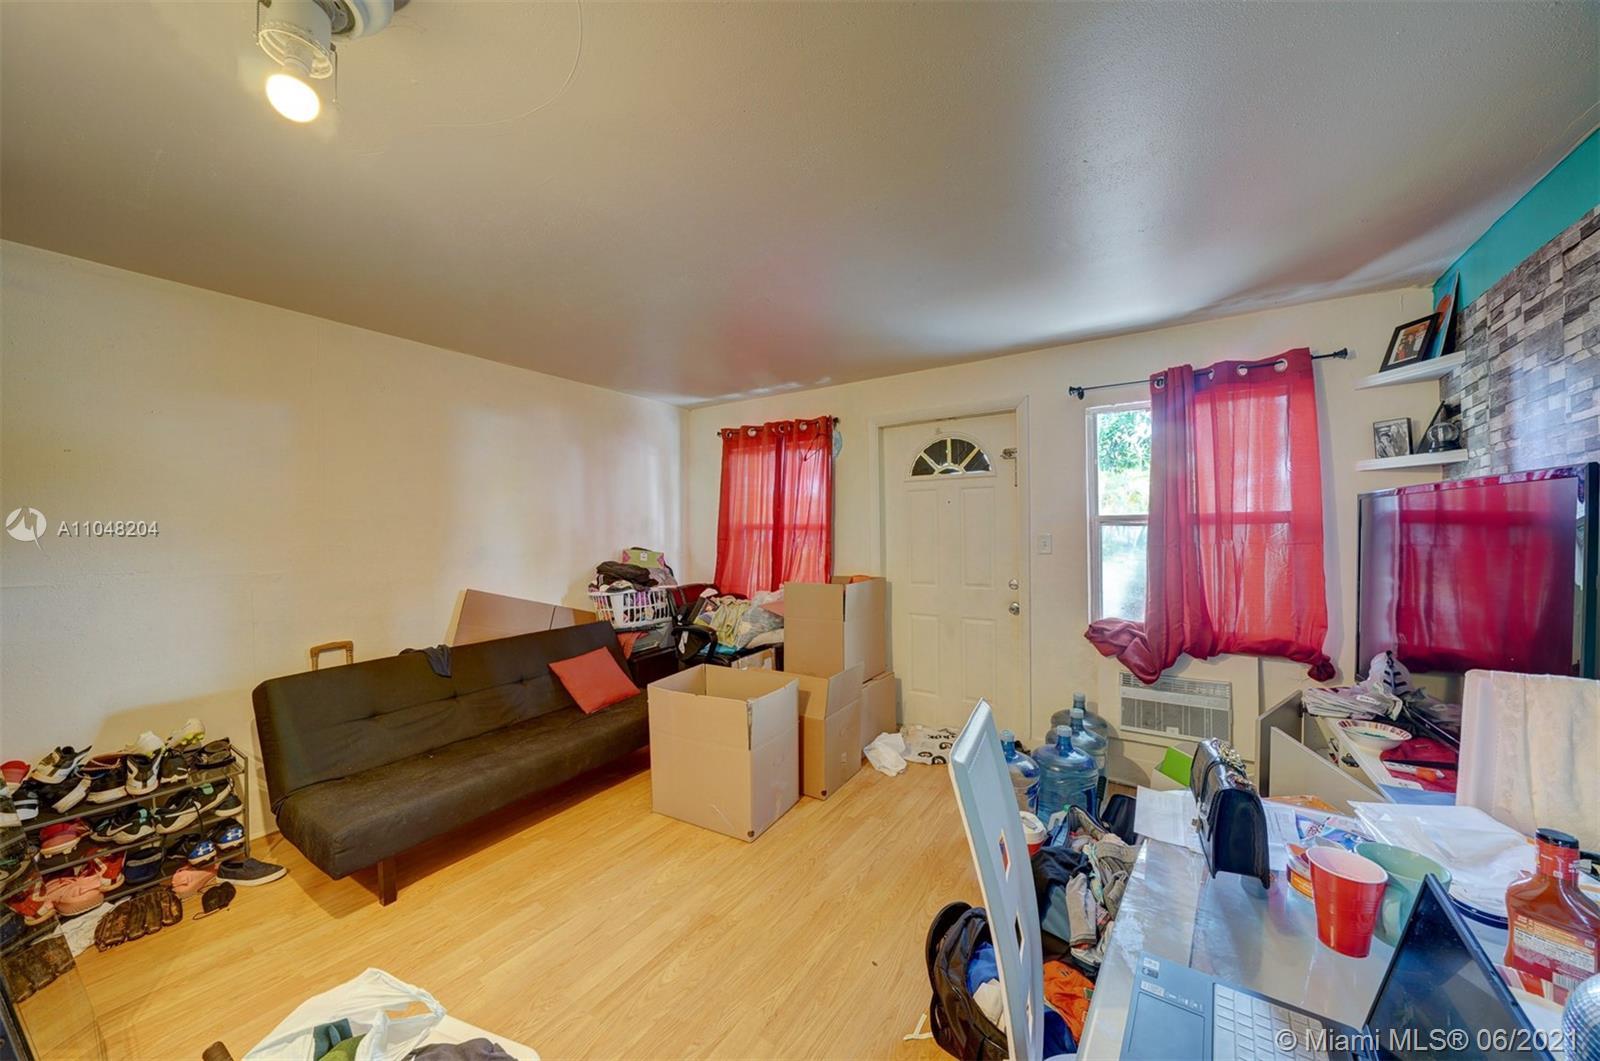 /  2922 sq. ft. $ 2021-05-26 0 Photo